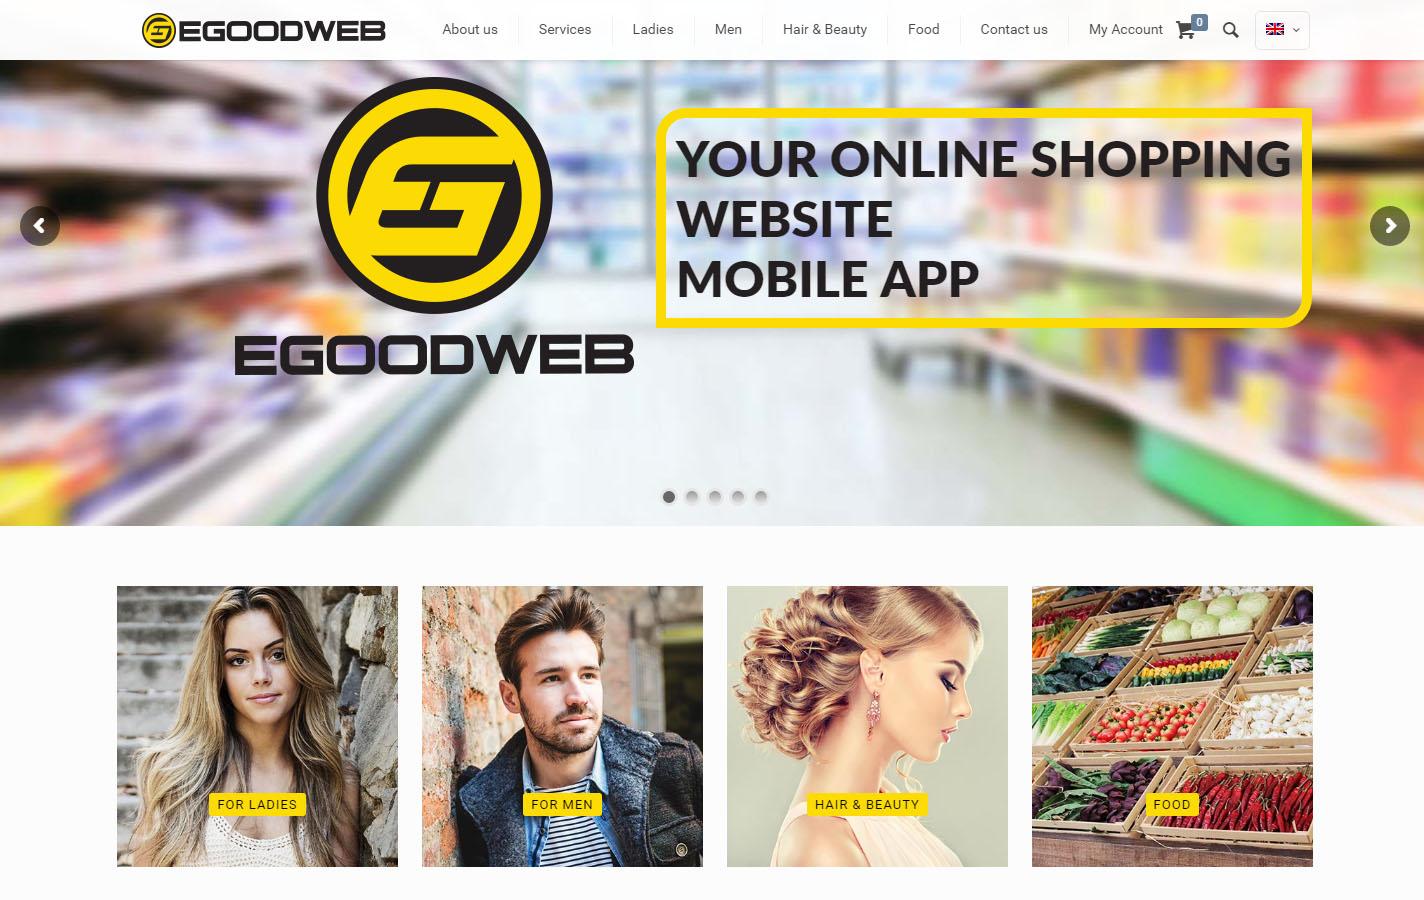 egoodweb